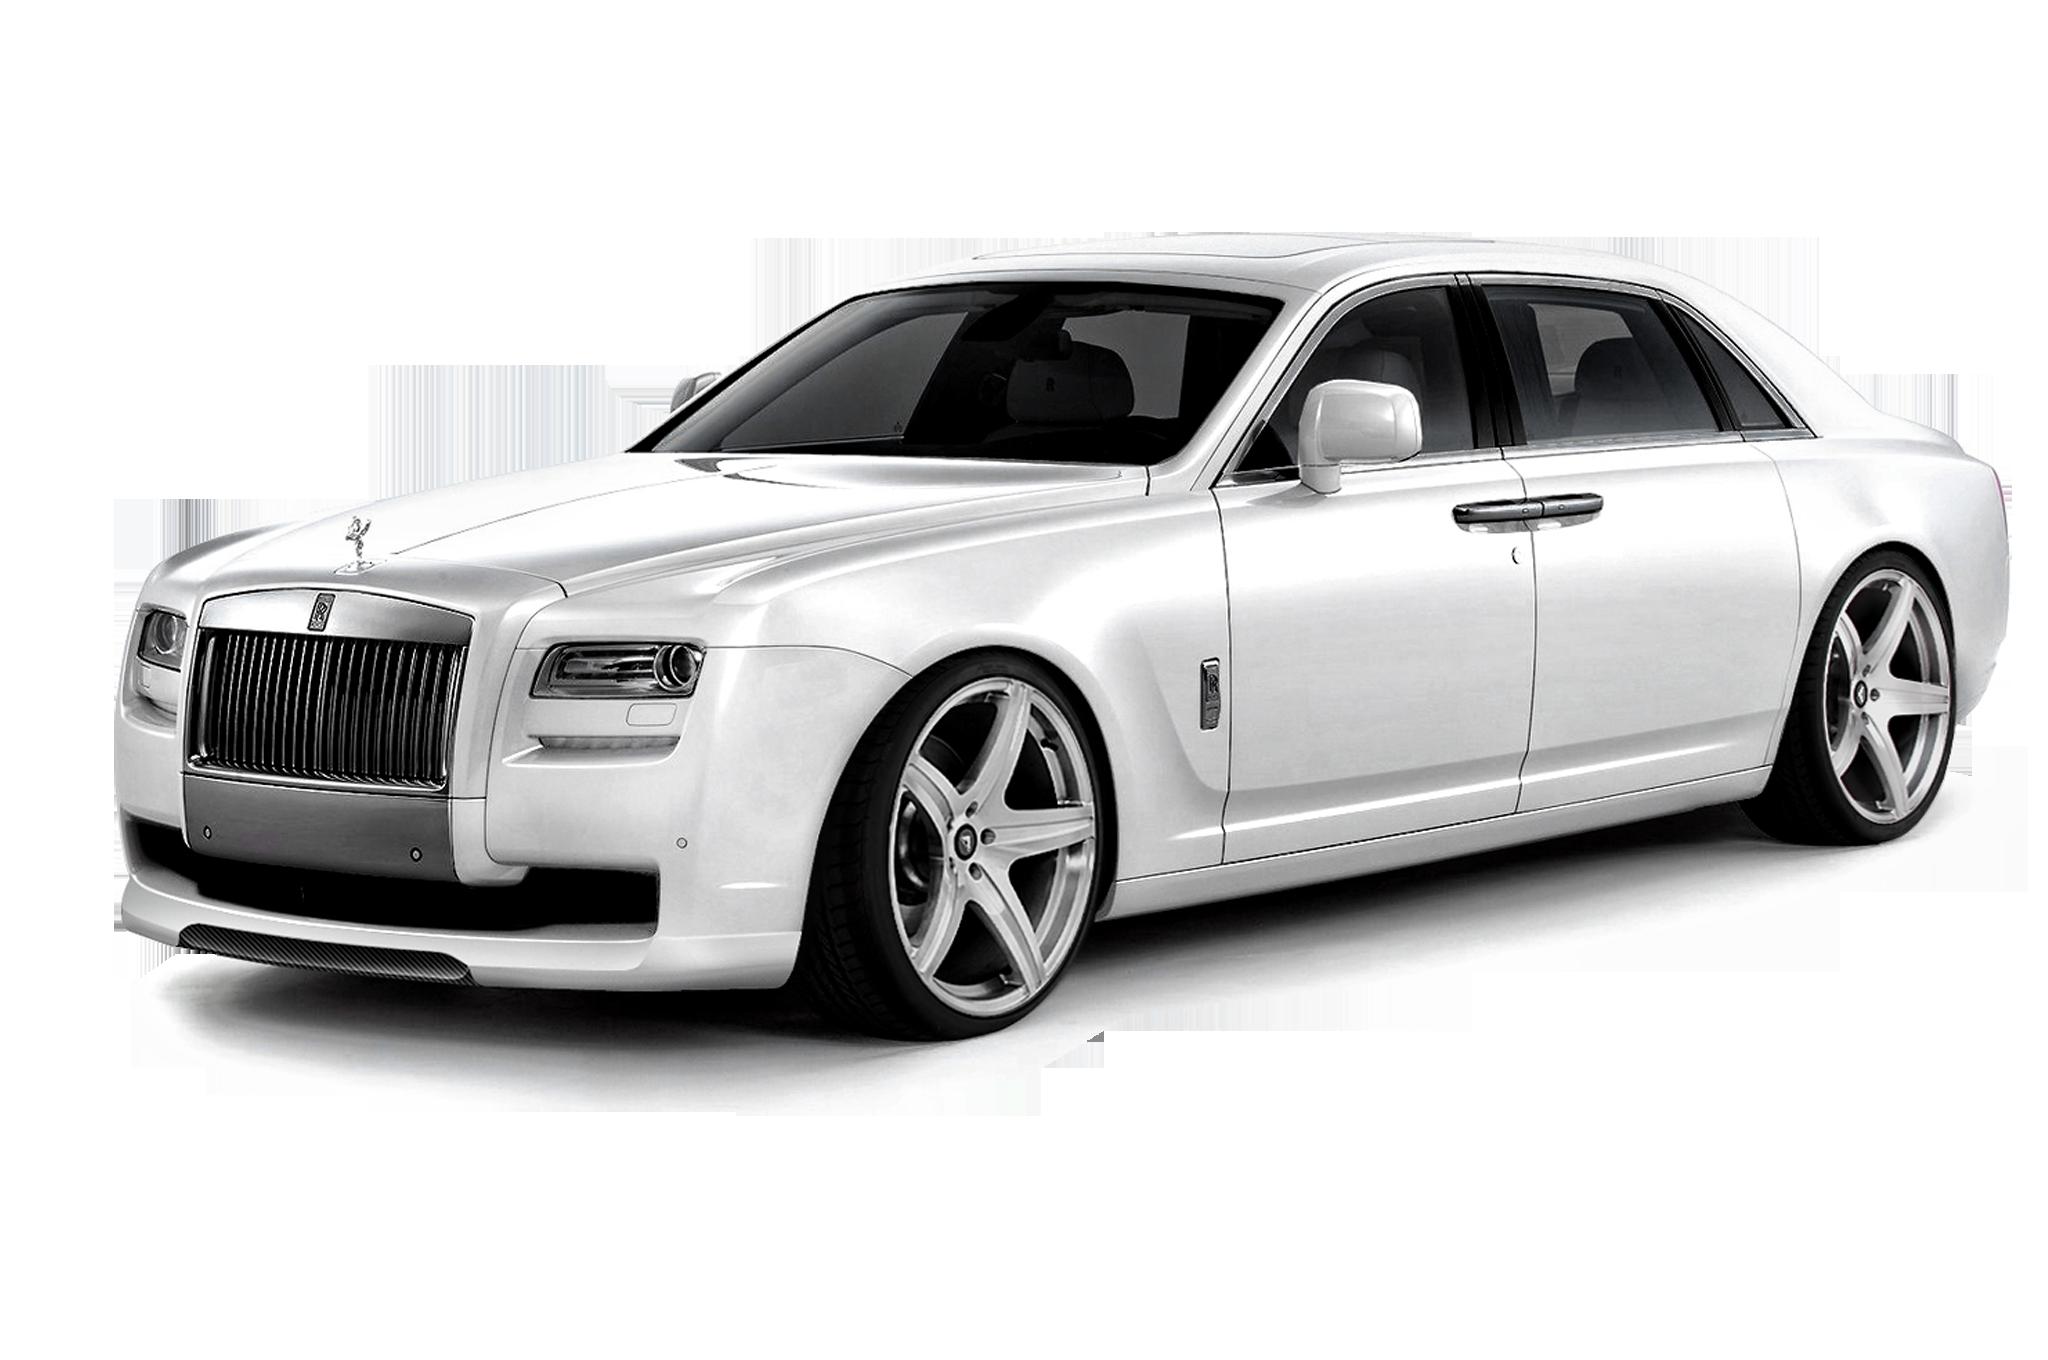 Rolls Royce Car Rolls Royce Cars Rolls Royce Royce